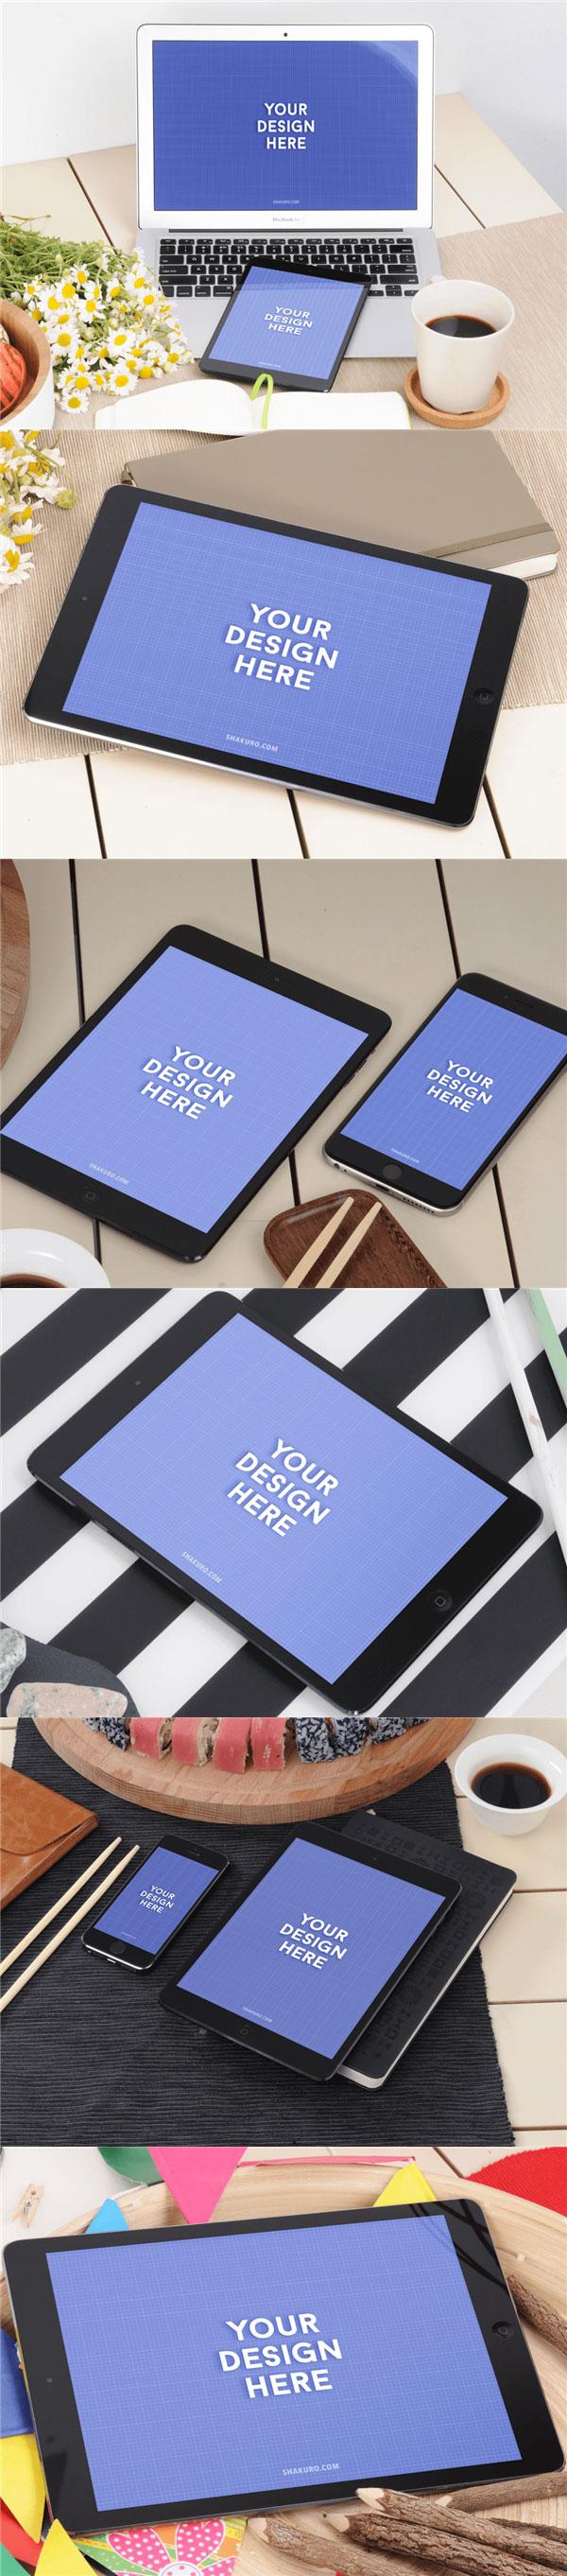 iPad样机场景